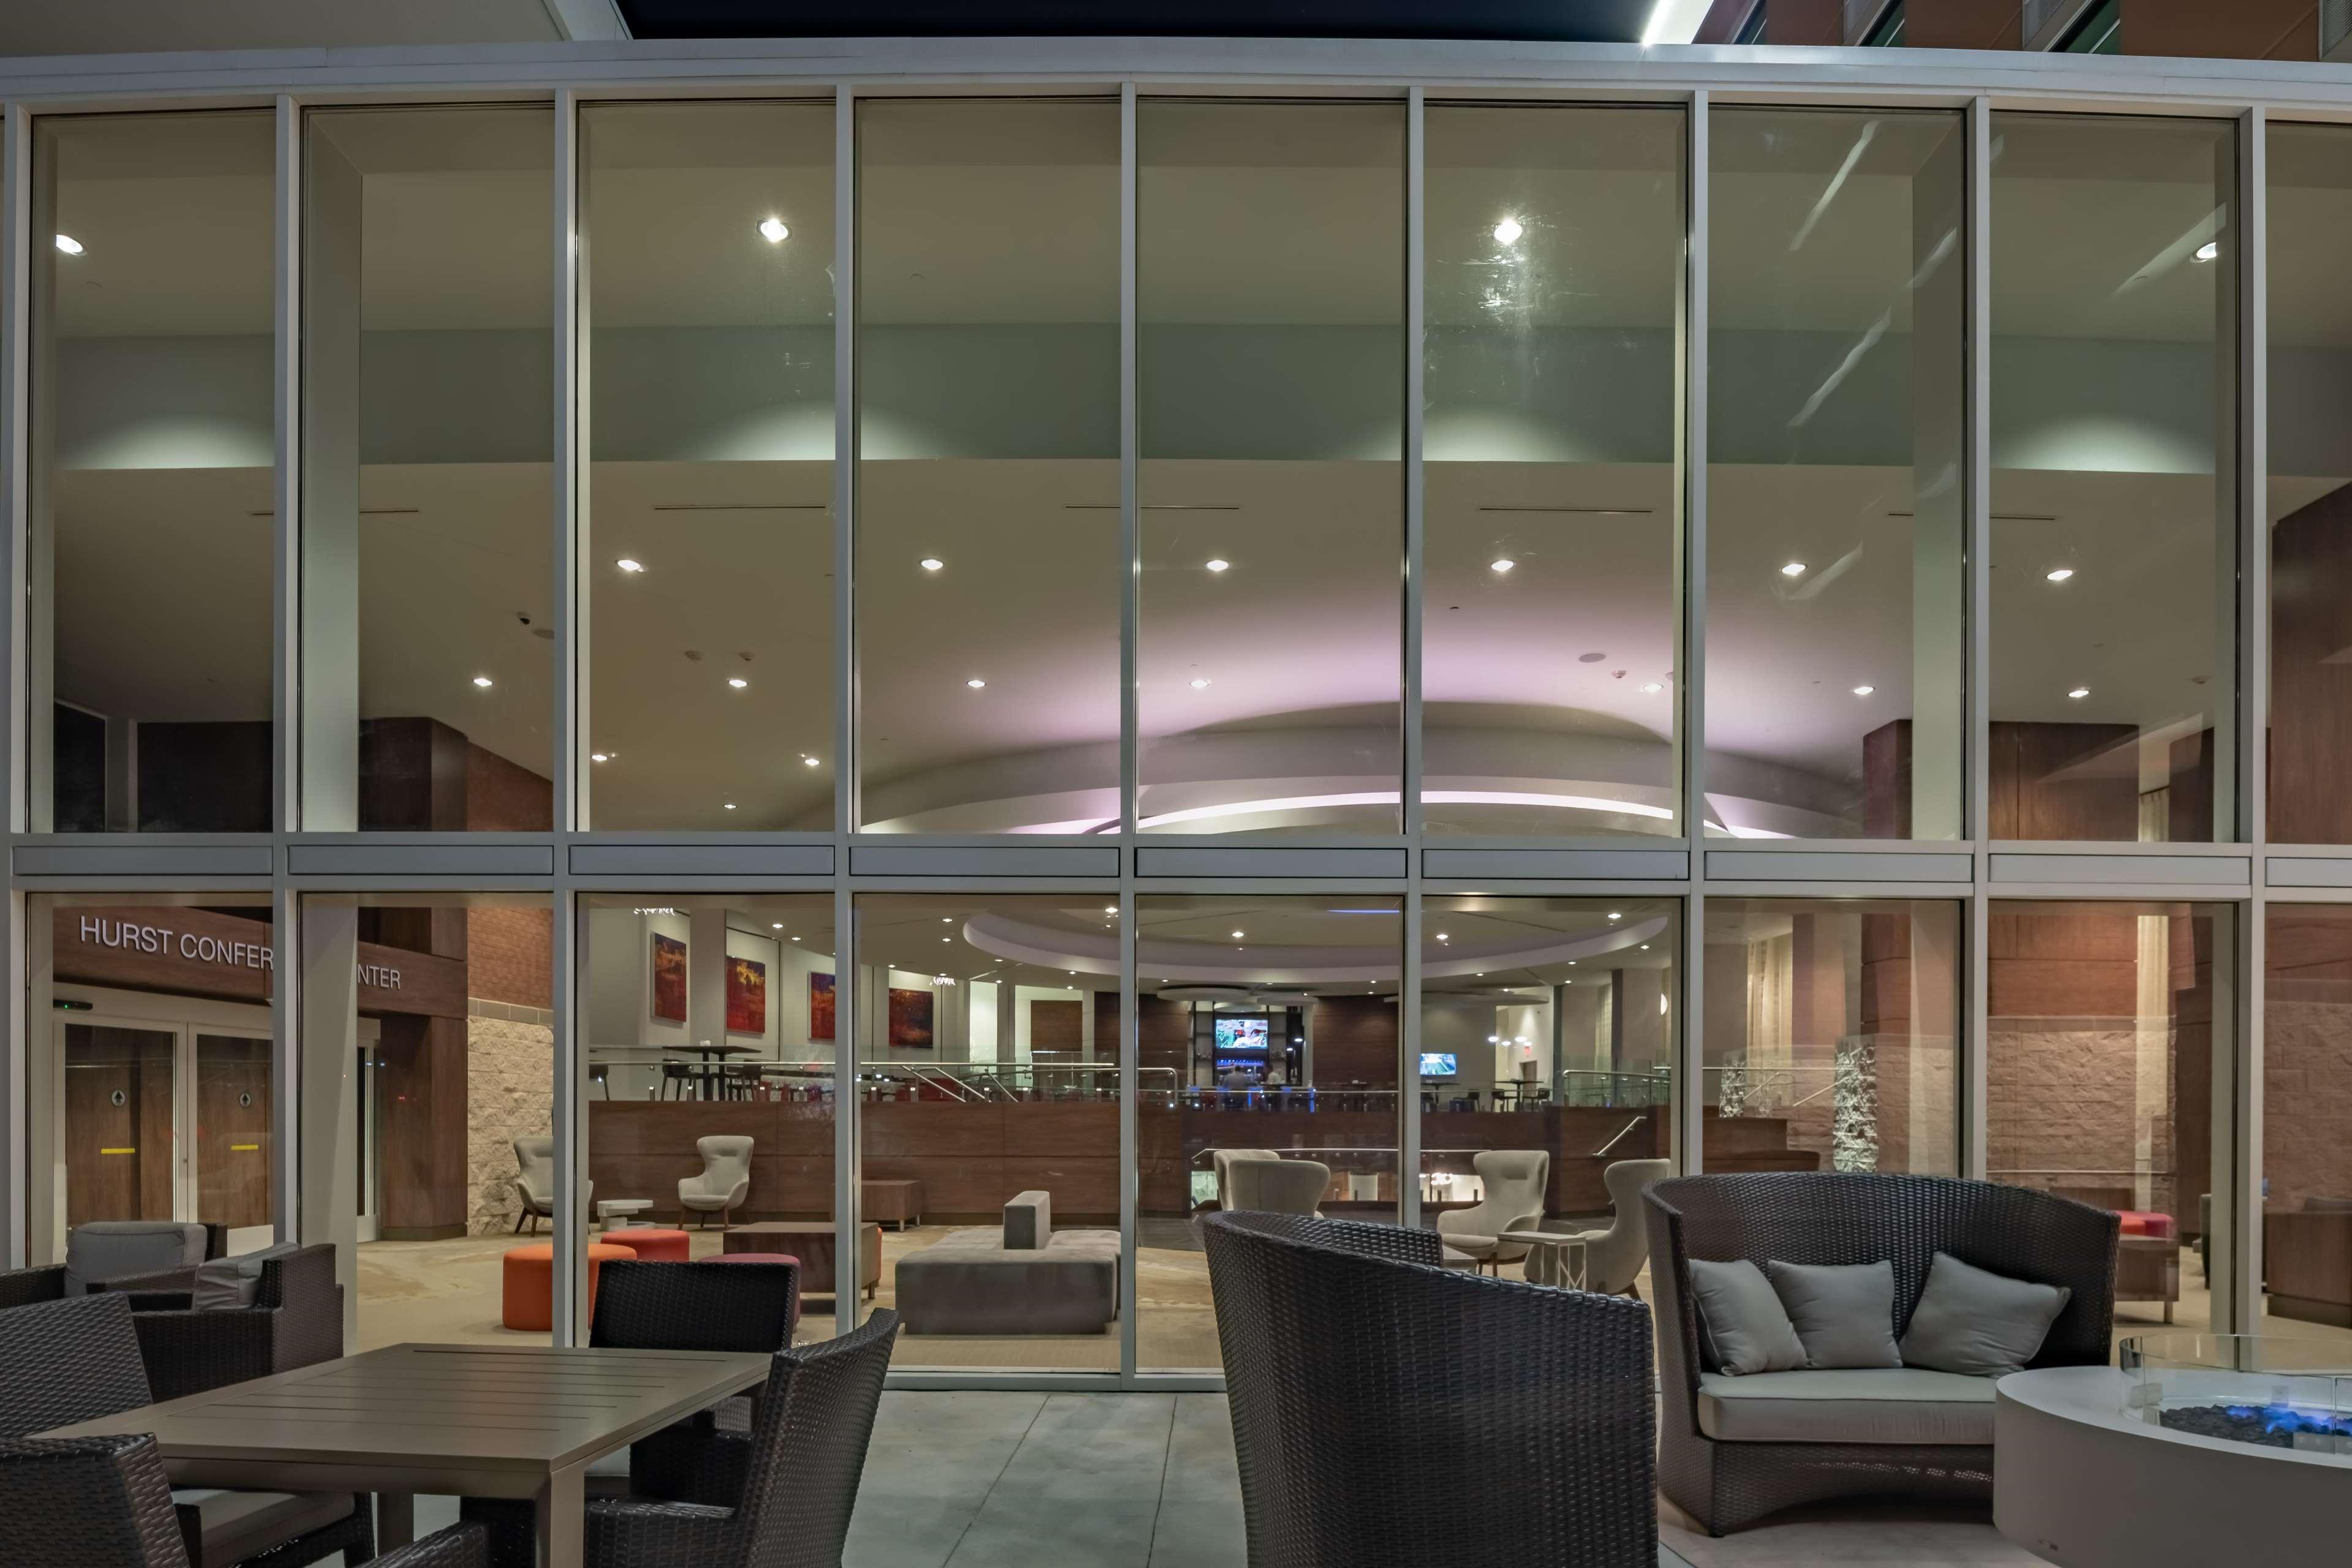 Hilton Garden Inn Dallas at Hurst Conference Center image 1